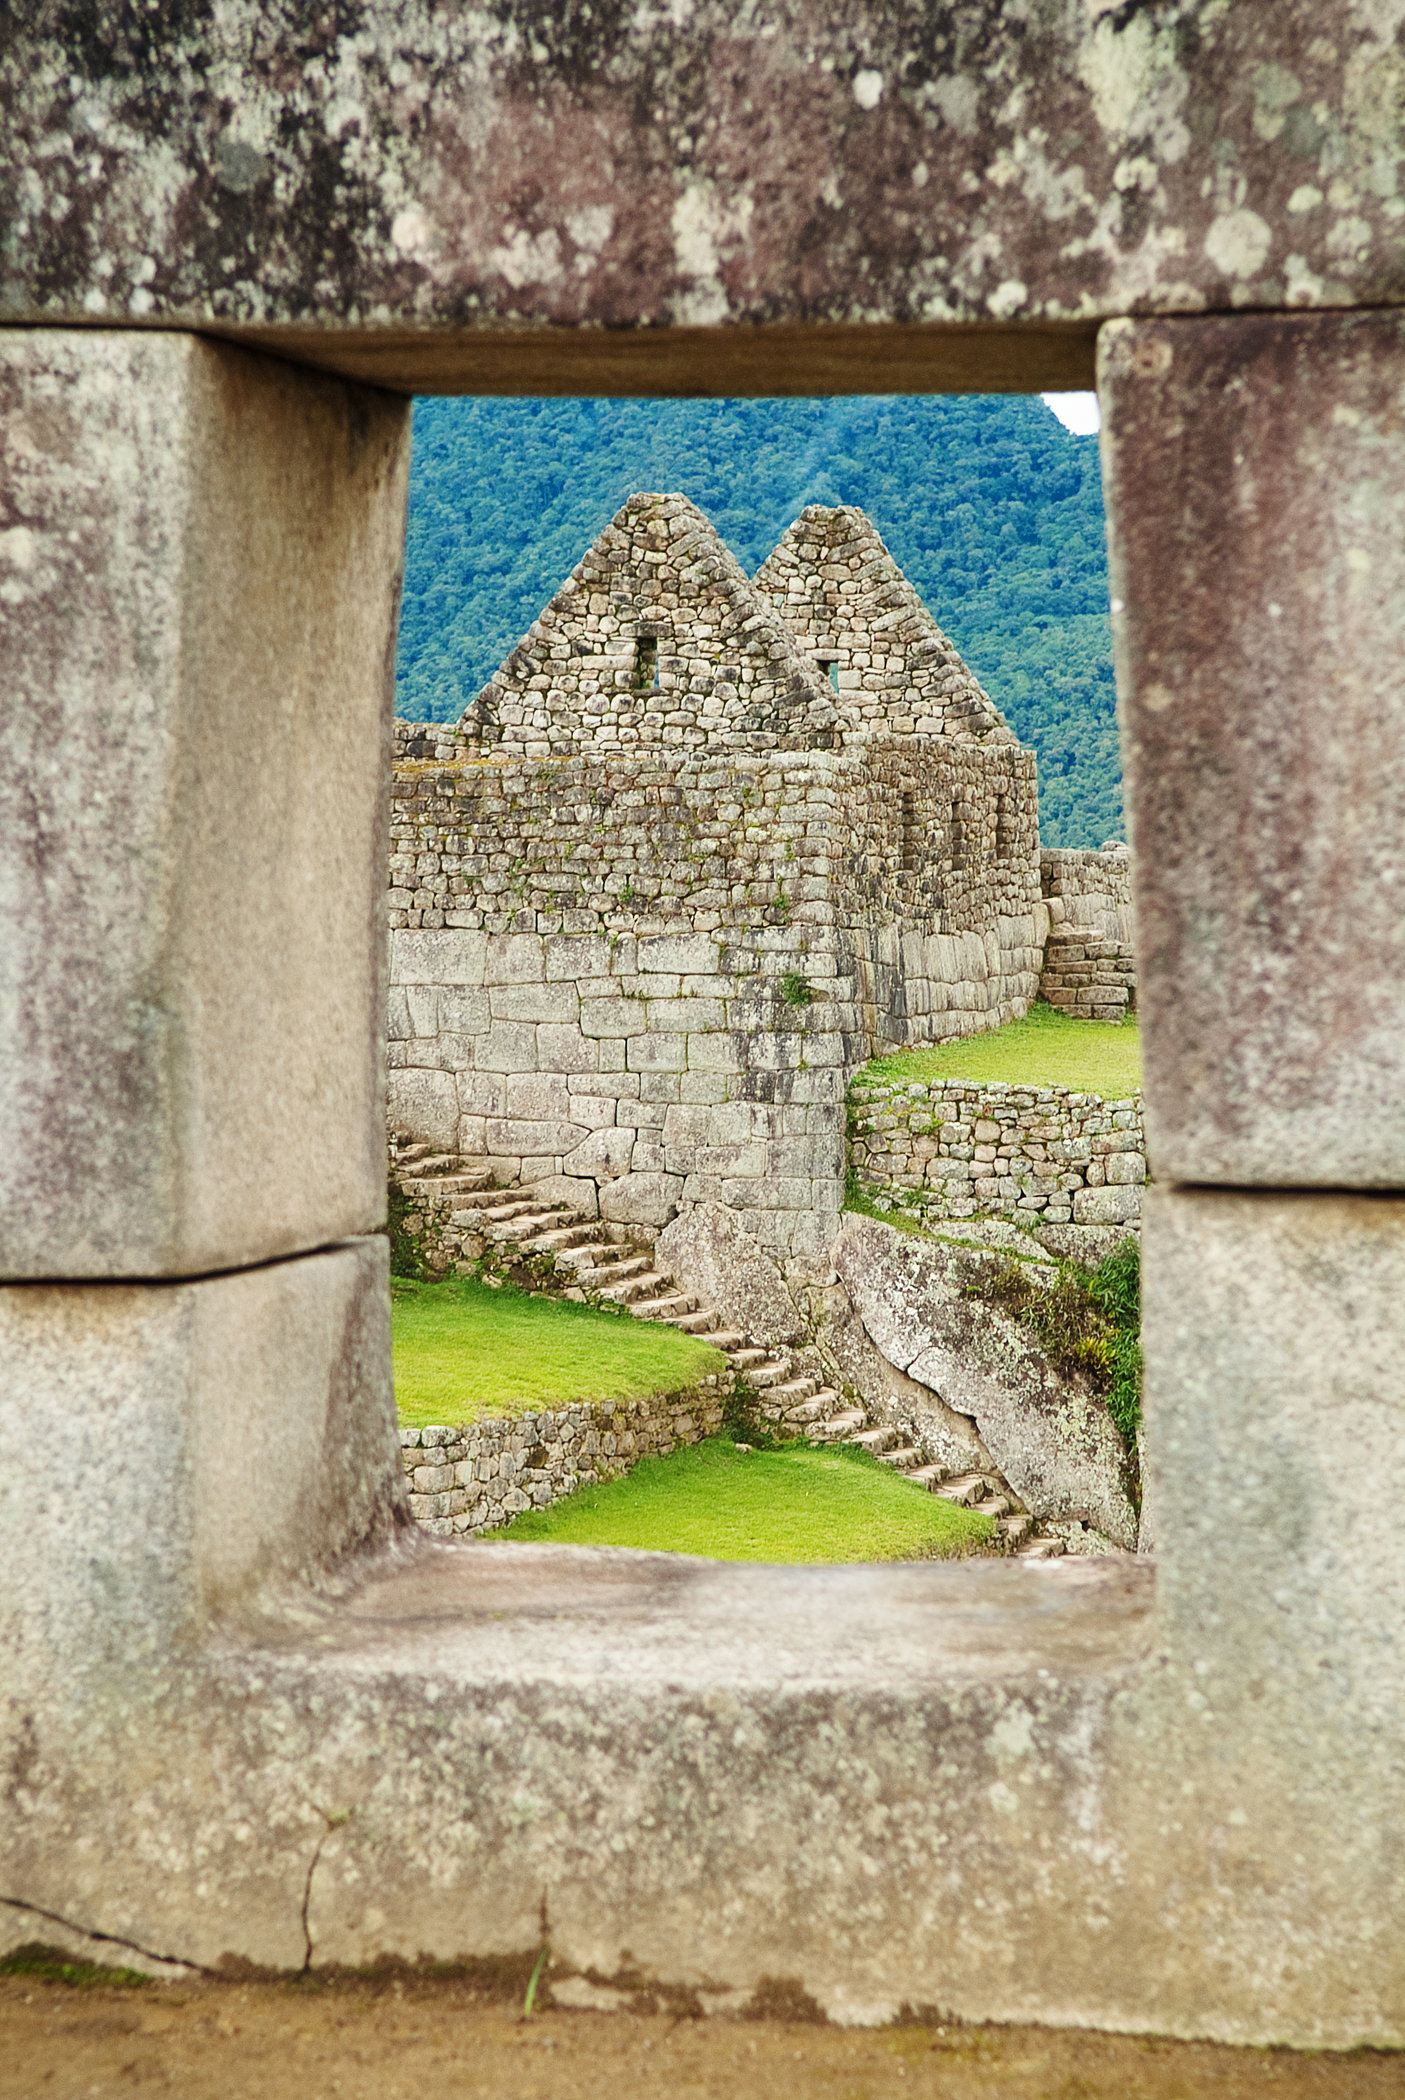 Room with a view - Machu Pichu